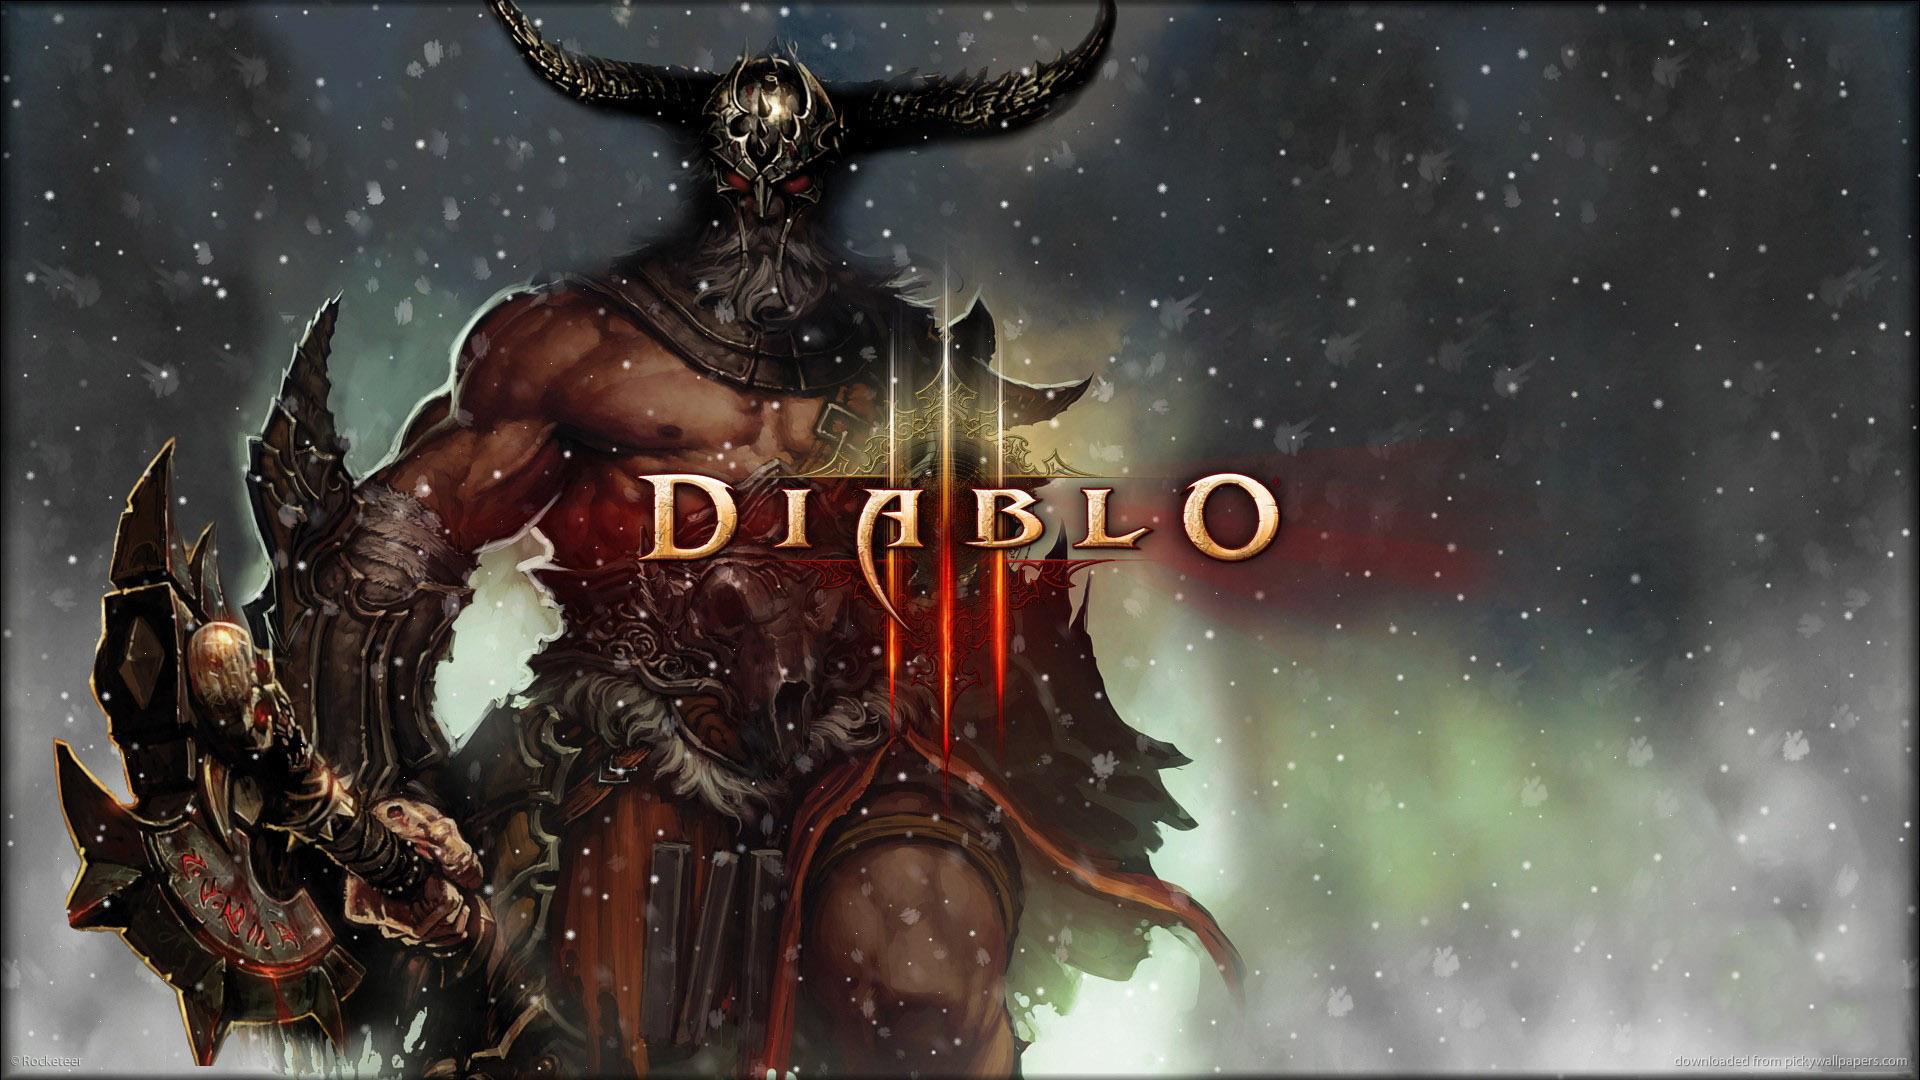 Diablo 3 Barbarian wallpaper   876995 1920x1080